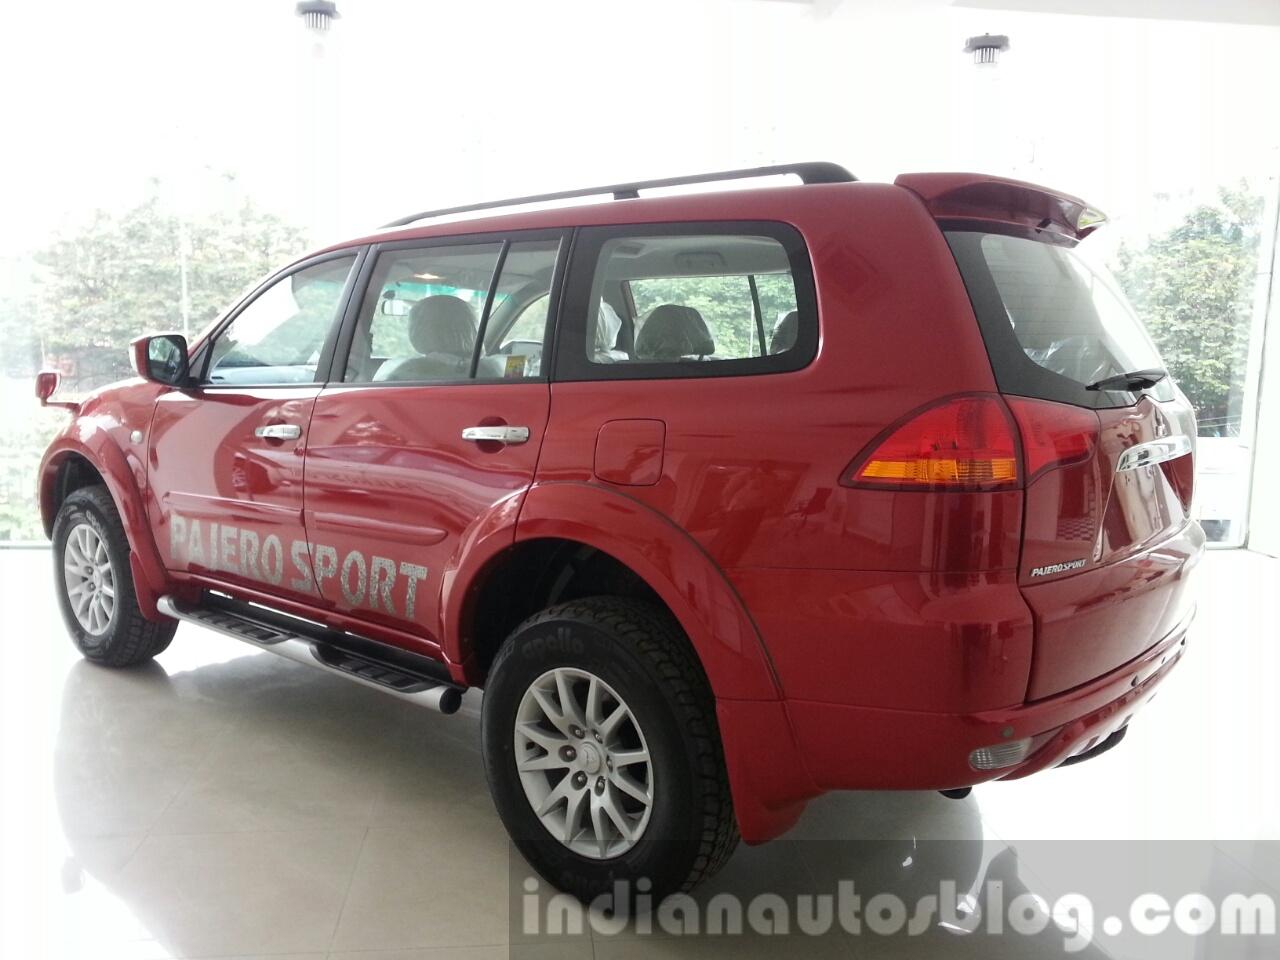 2014 Mitsubishi Pajero Sport facelift rear quarter India